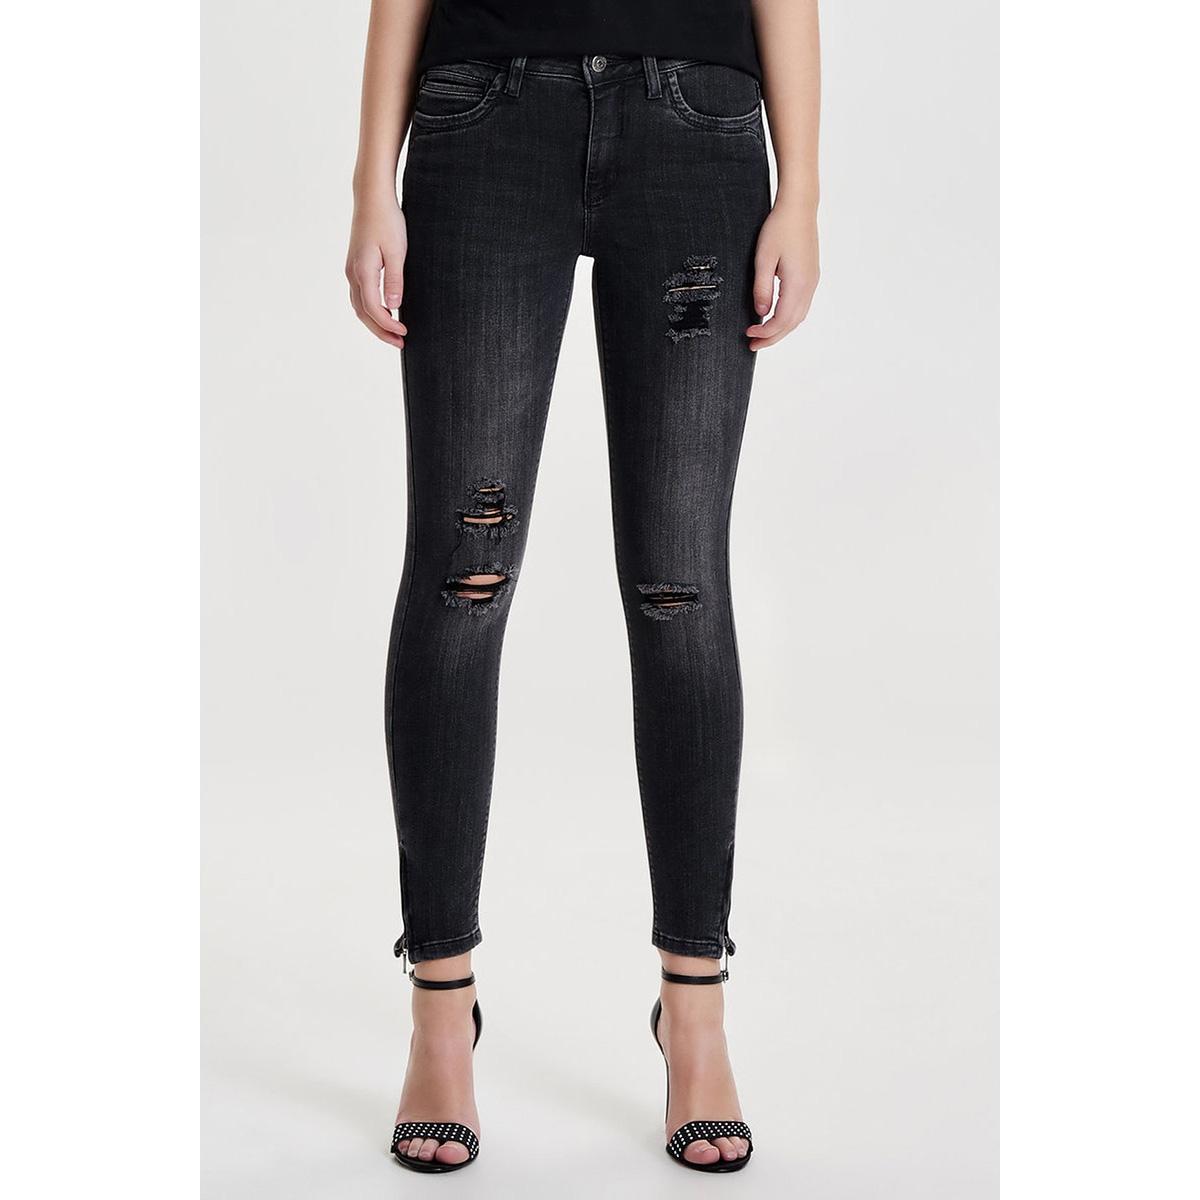 onlkendell ank zip grey dnm jns cre 15133753 only jeans grey denim